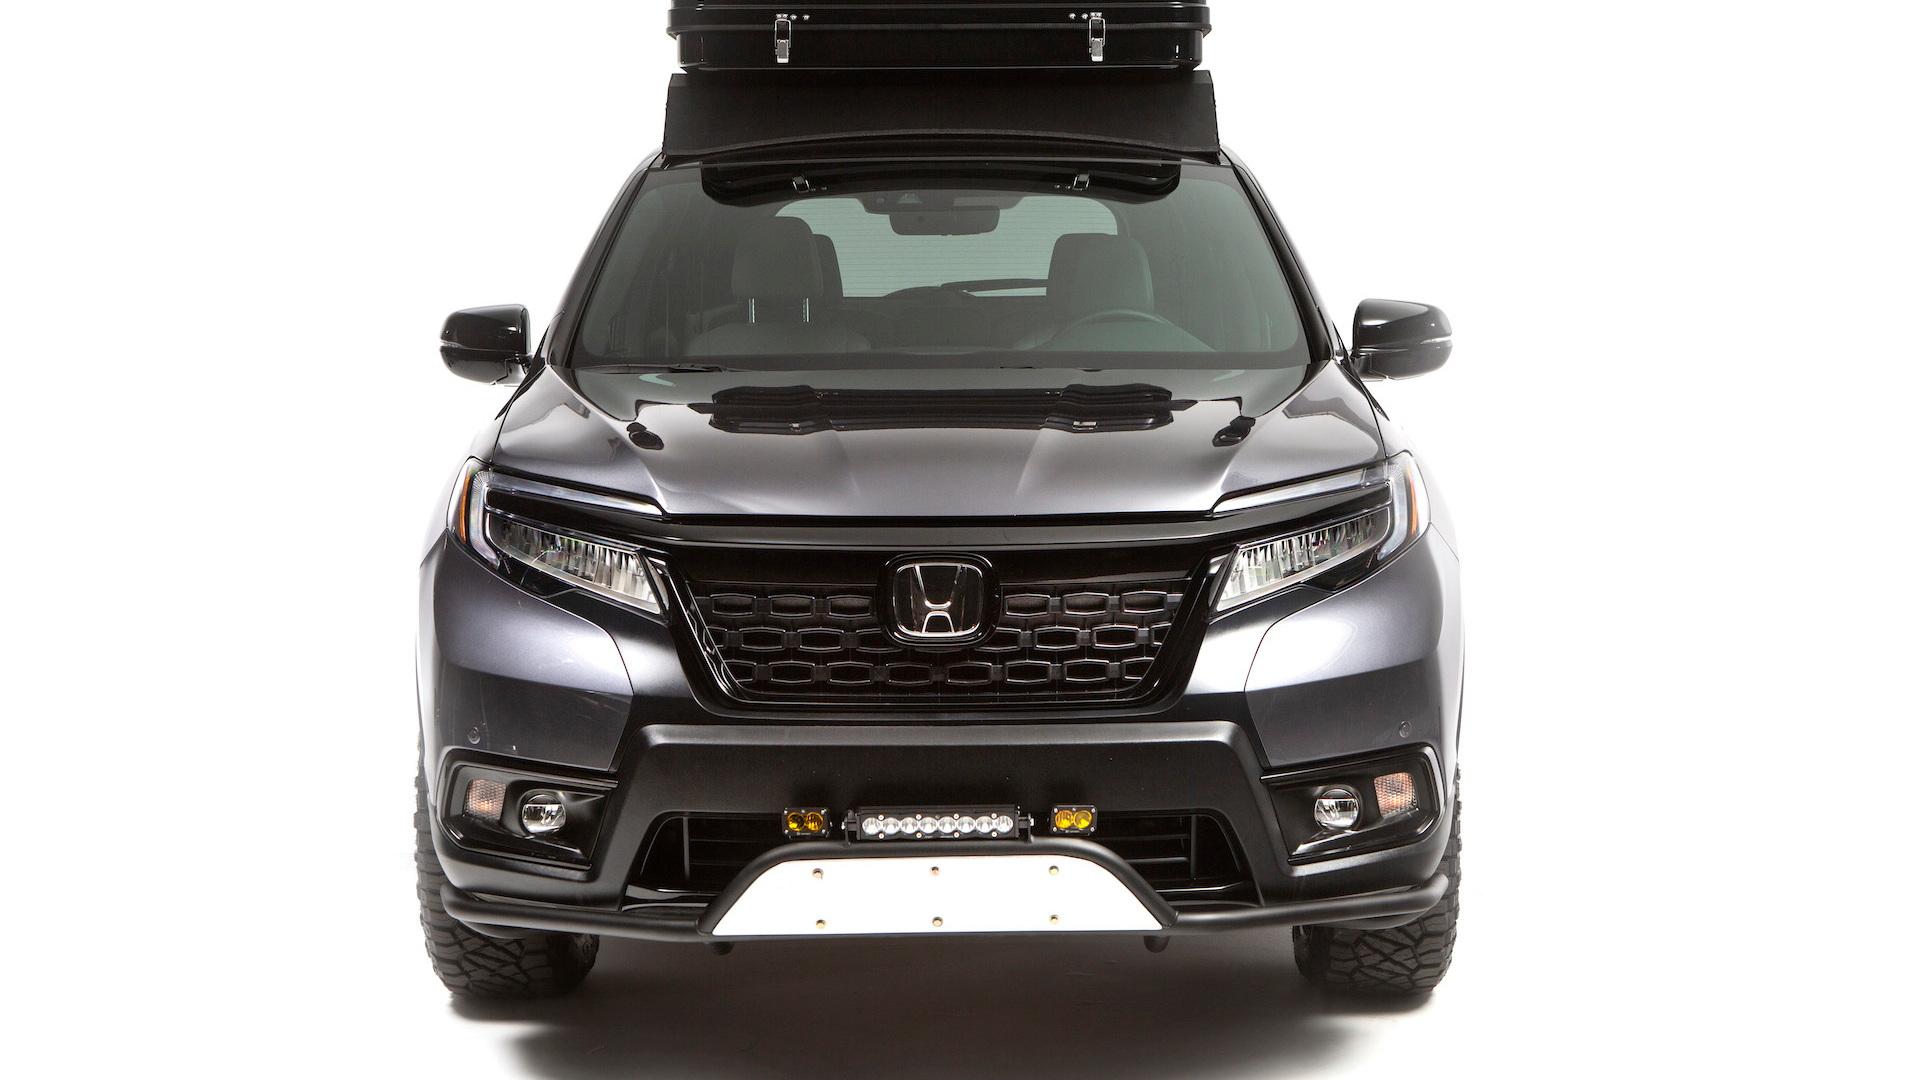 Honda Passport overlanding concept